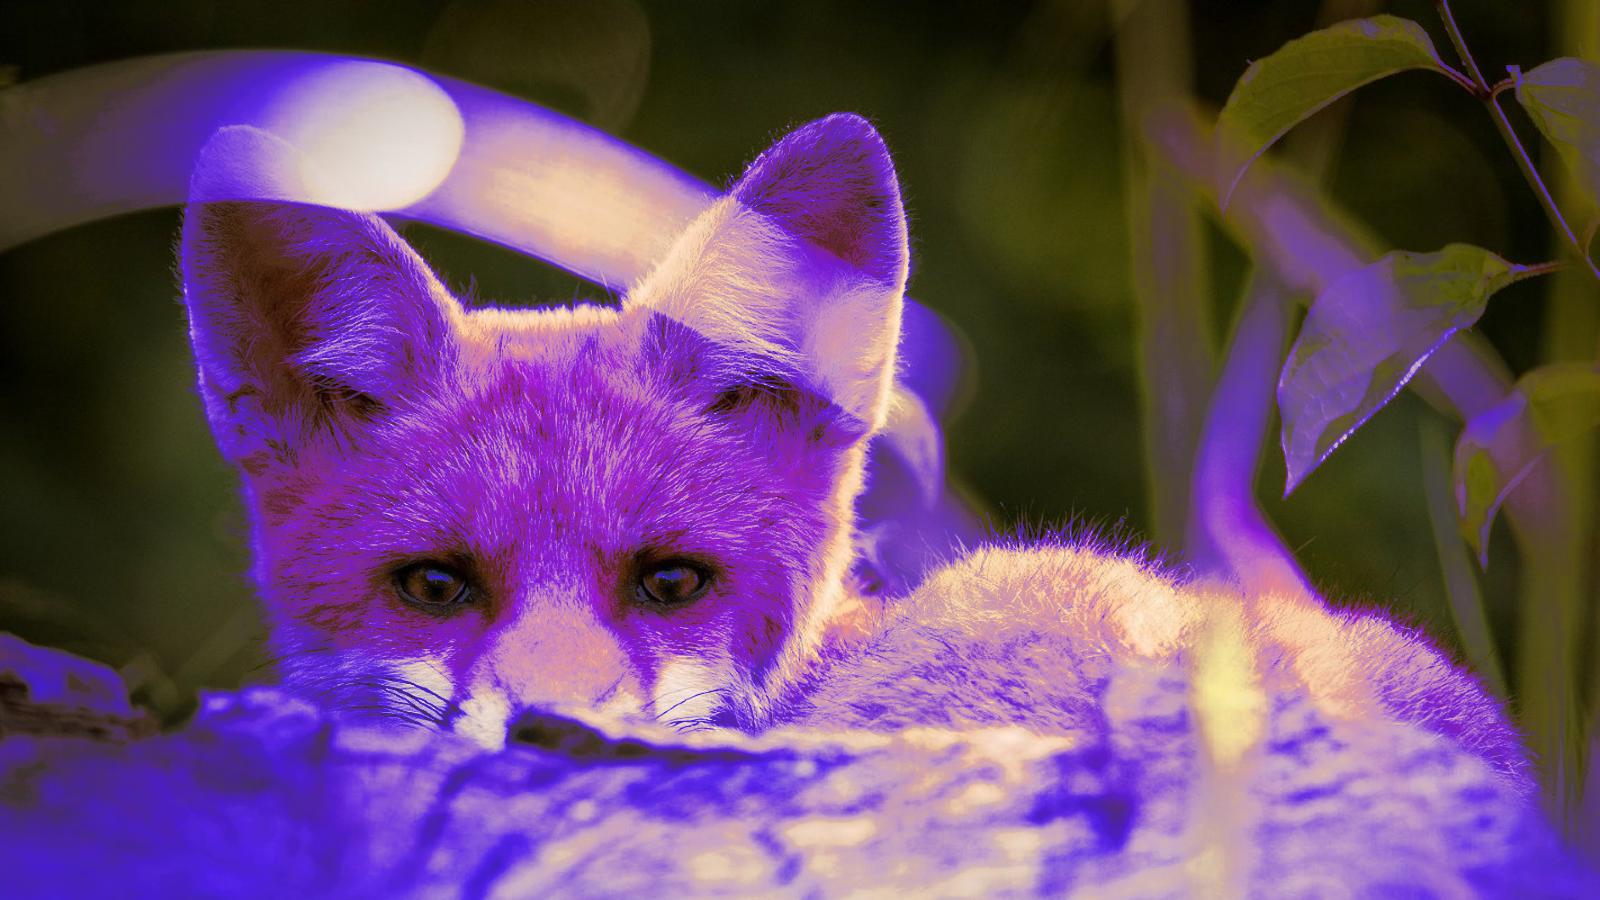 New PurpleFox botnet variant uses WebSockets for C2 communication